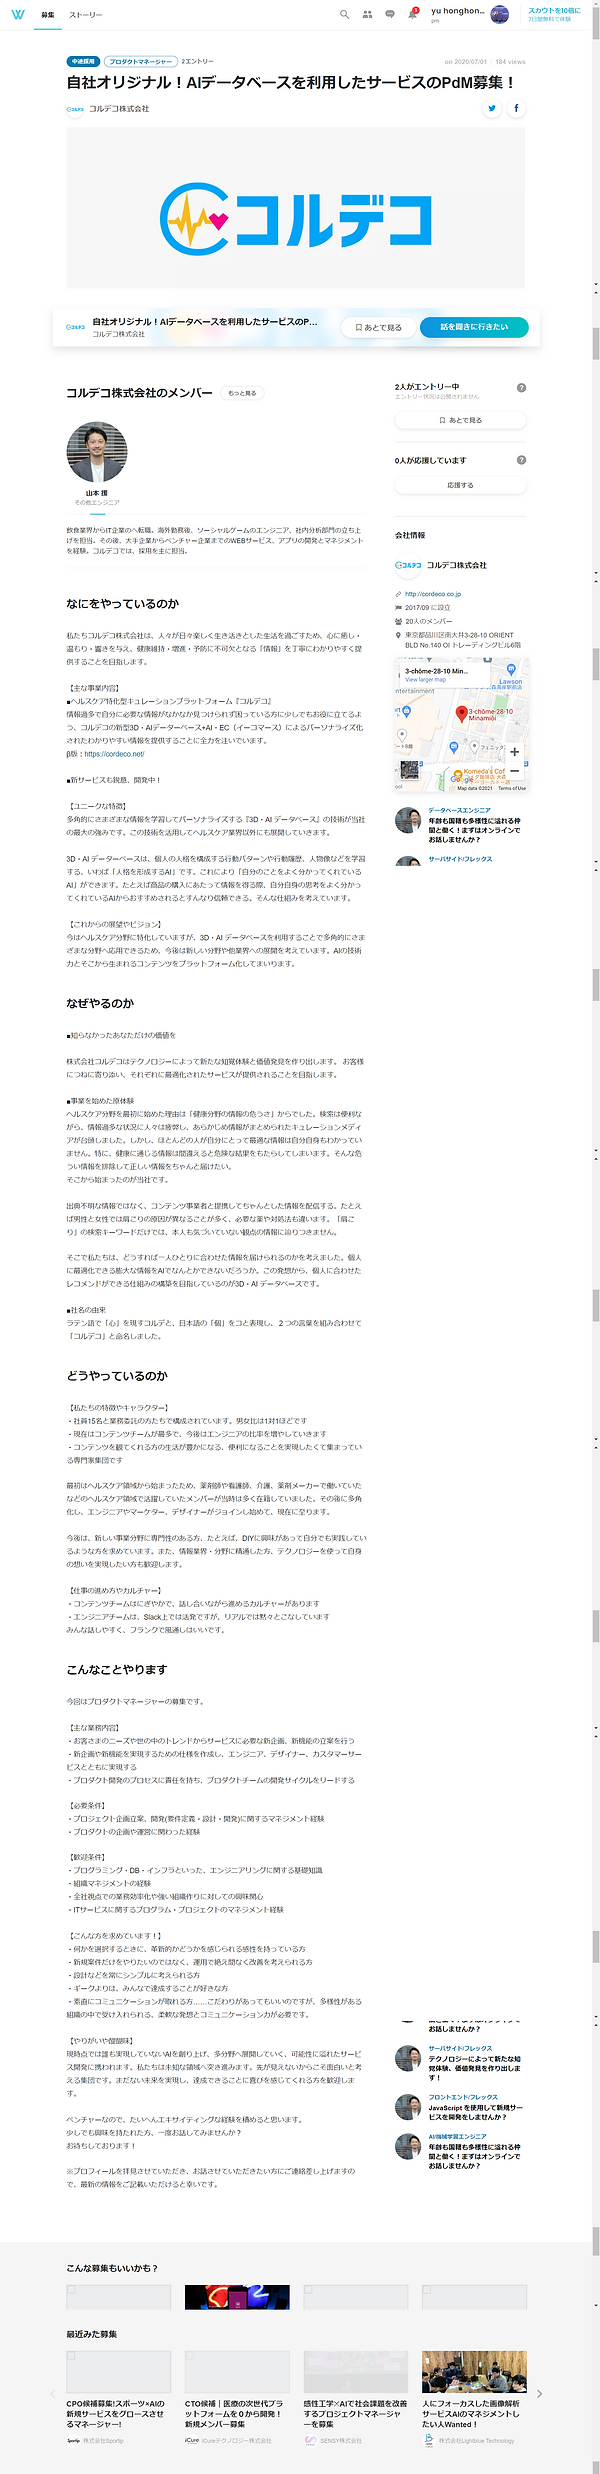 Screenshot (90).png